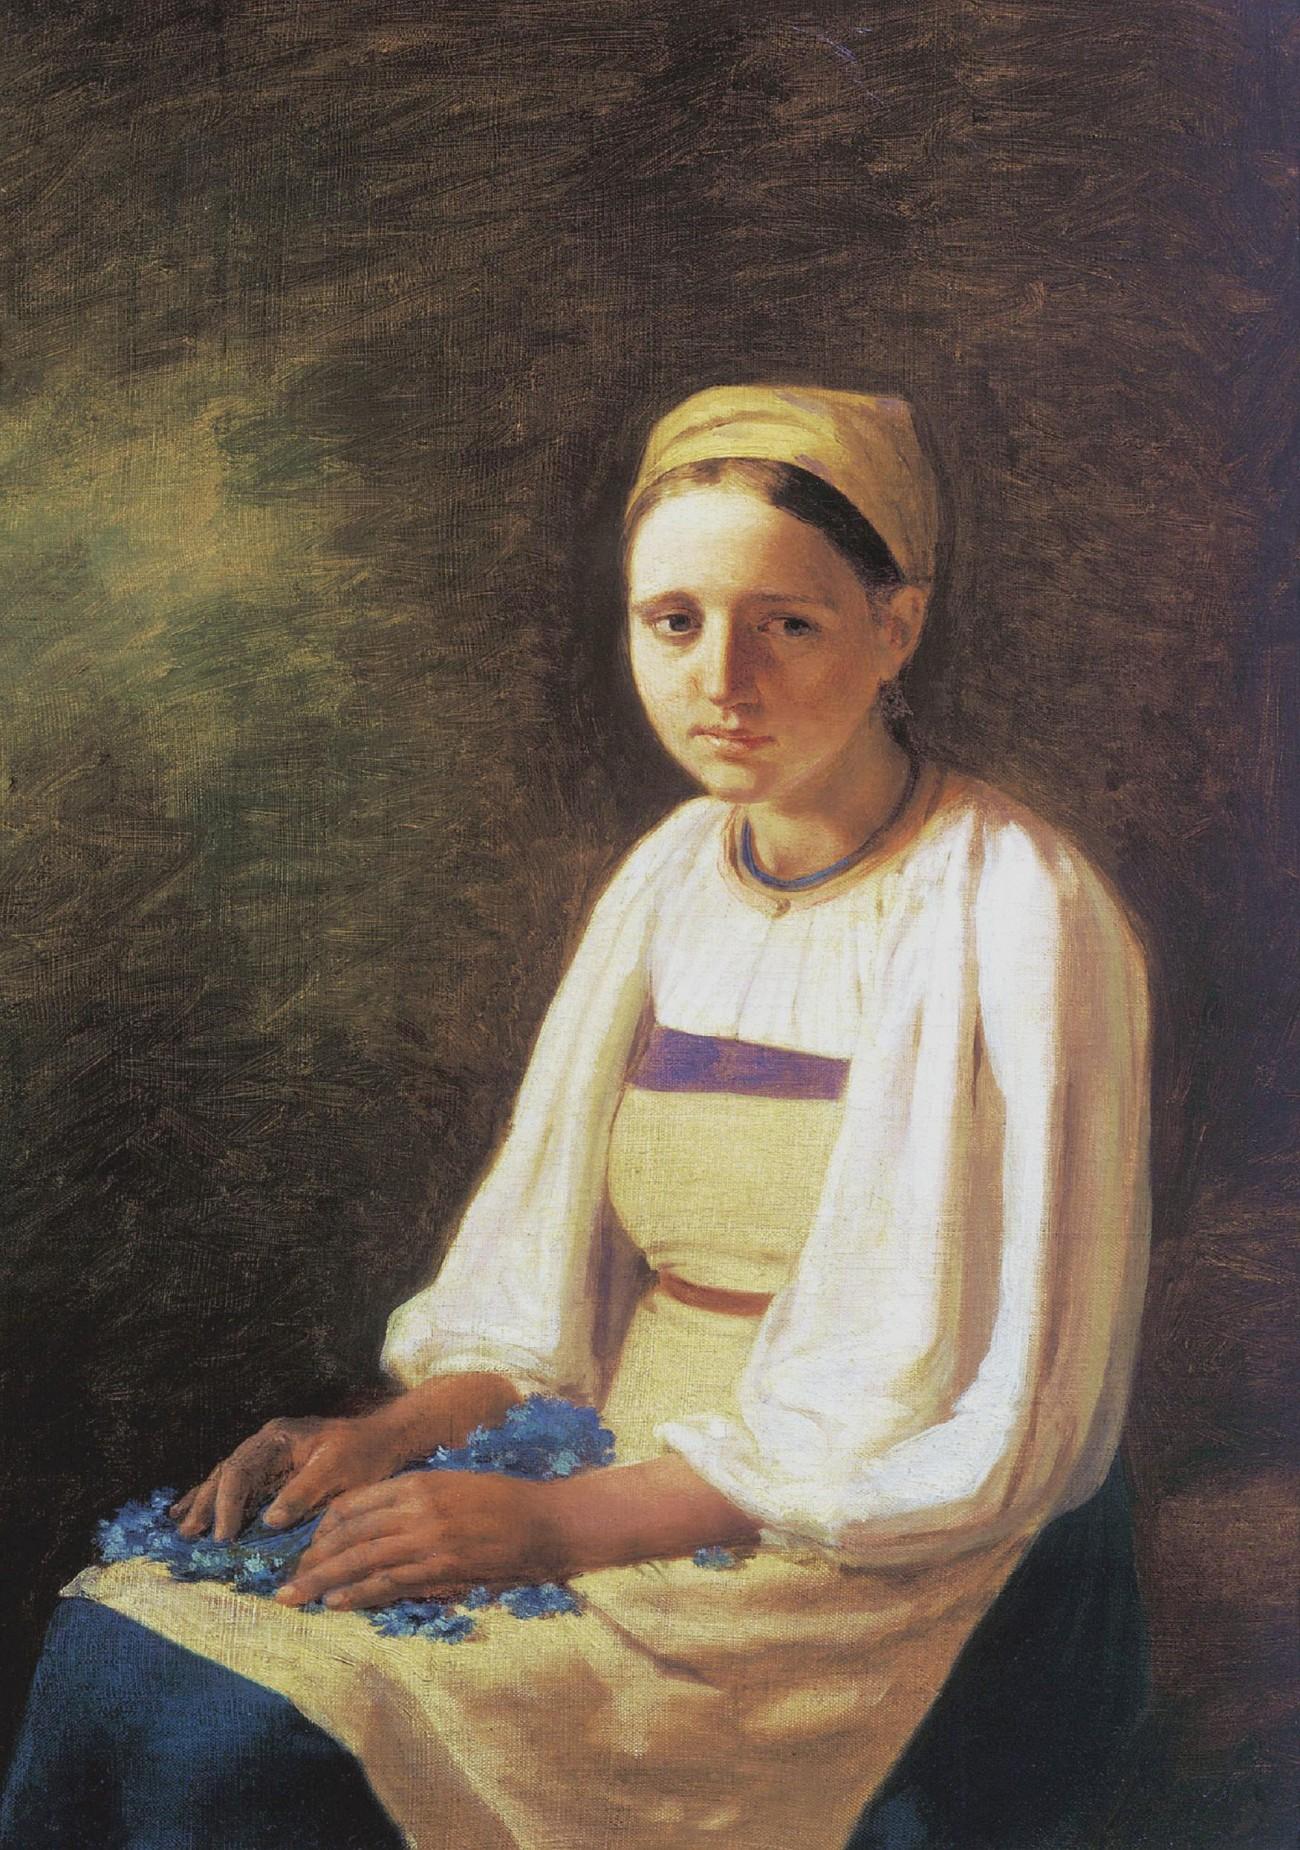 aleksei-venetsianov-a-peasant-girl-with-cornflowers-1820s-e1268418672311